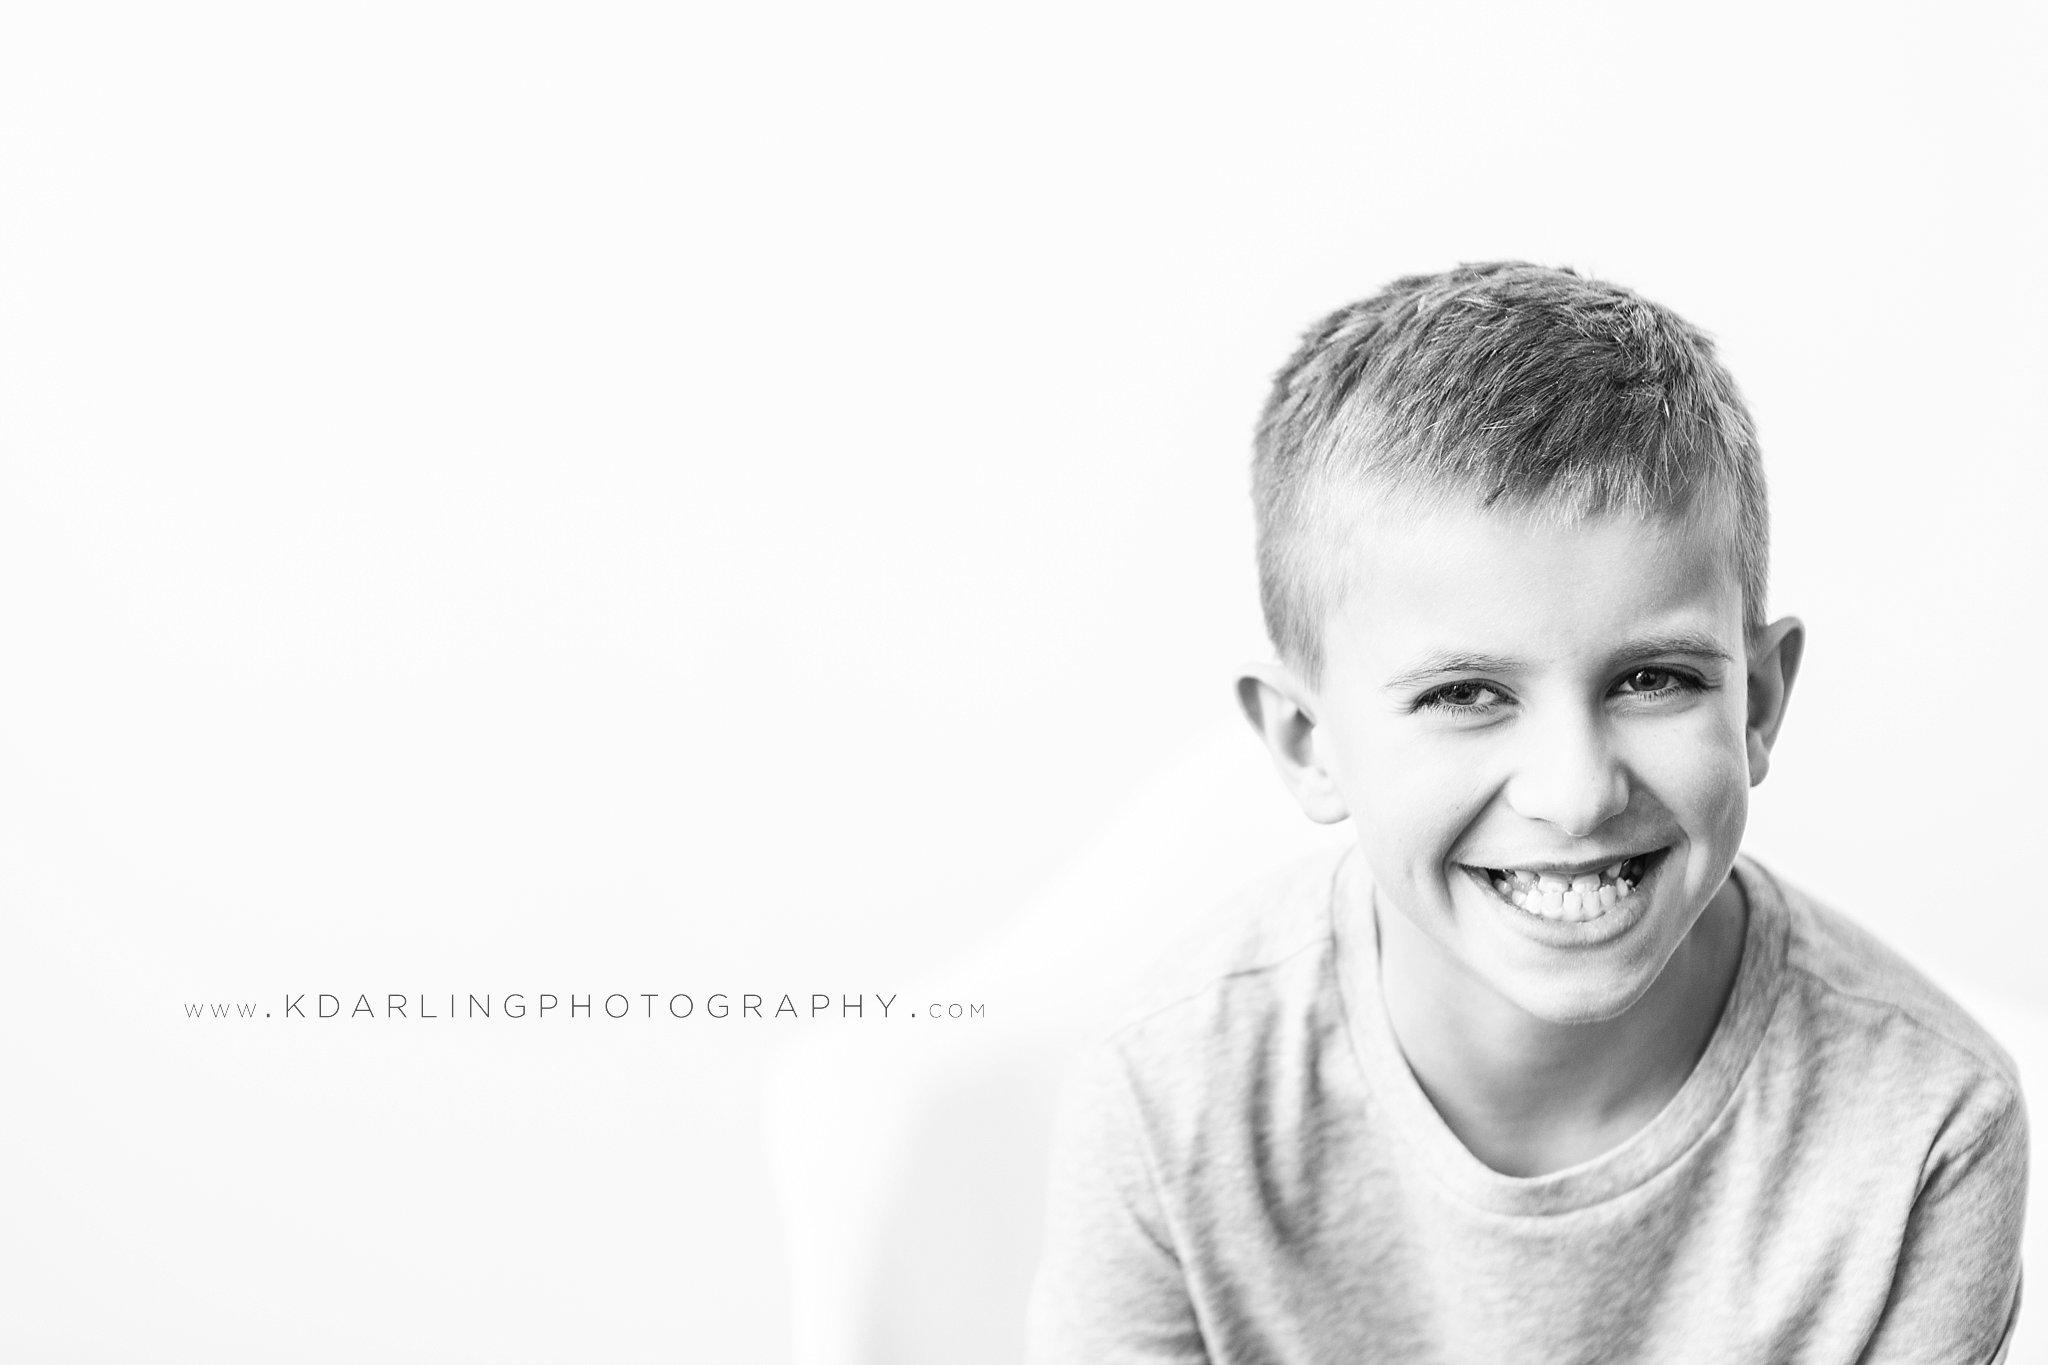 Child-Photographer-portraits-Champaign-County-IL-Fisher-Studio-Darling_0178.jpg